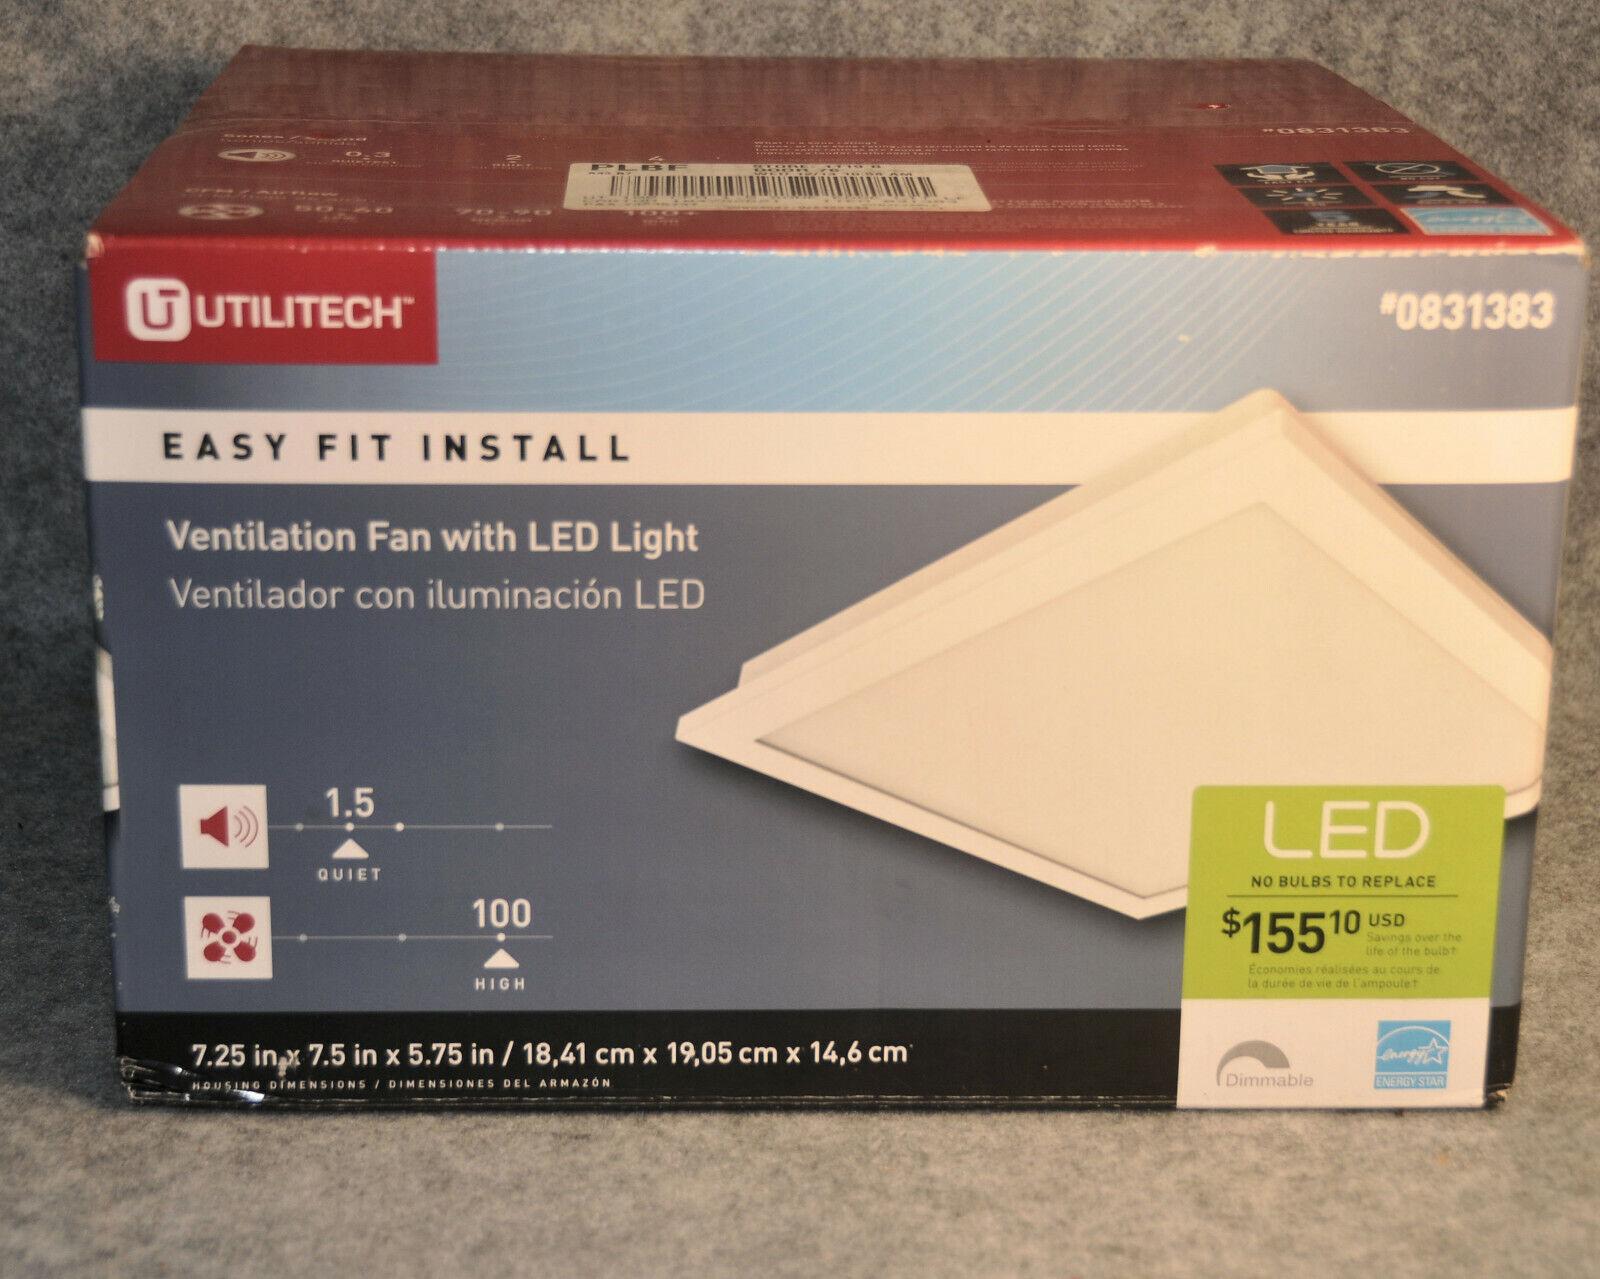 Utilitech 0831383 Ventilation Fan with LED Light 100 CFM  -